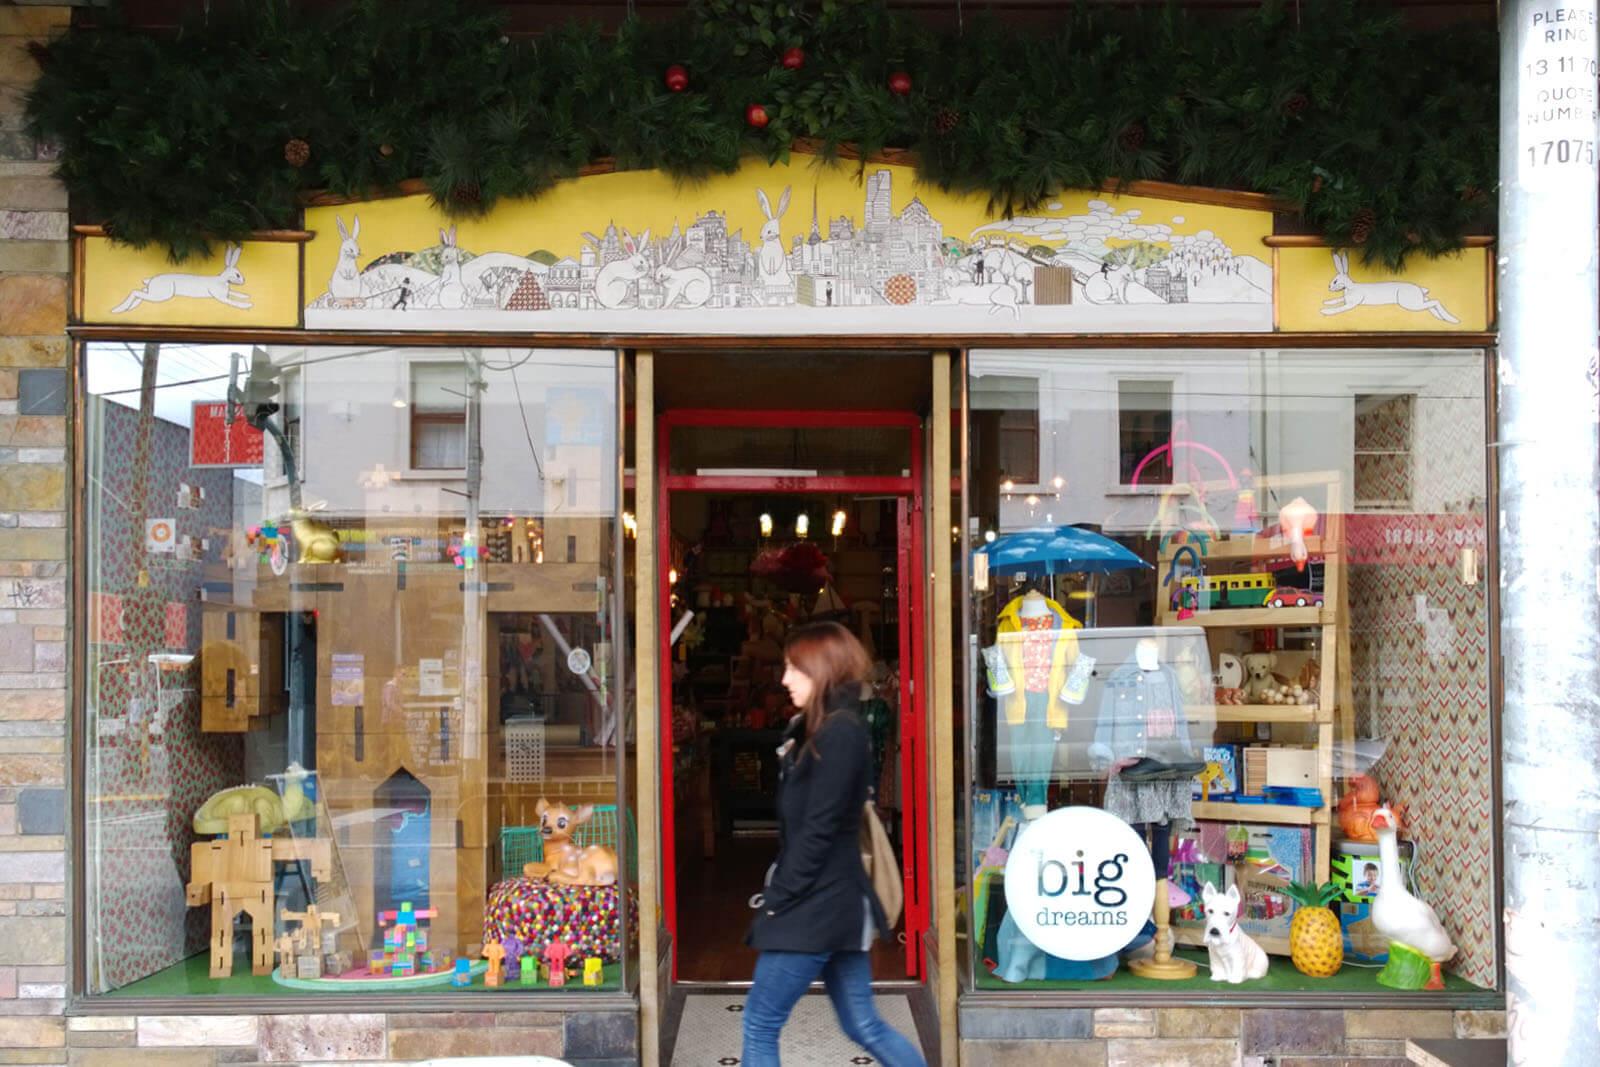 big dreams exterior shop paste-up mural, collingwood